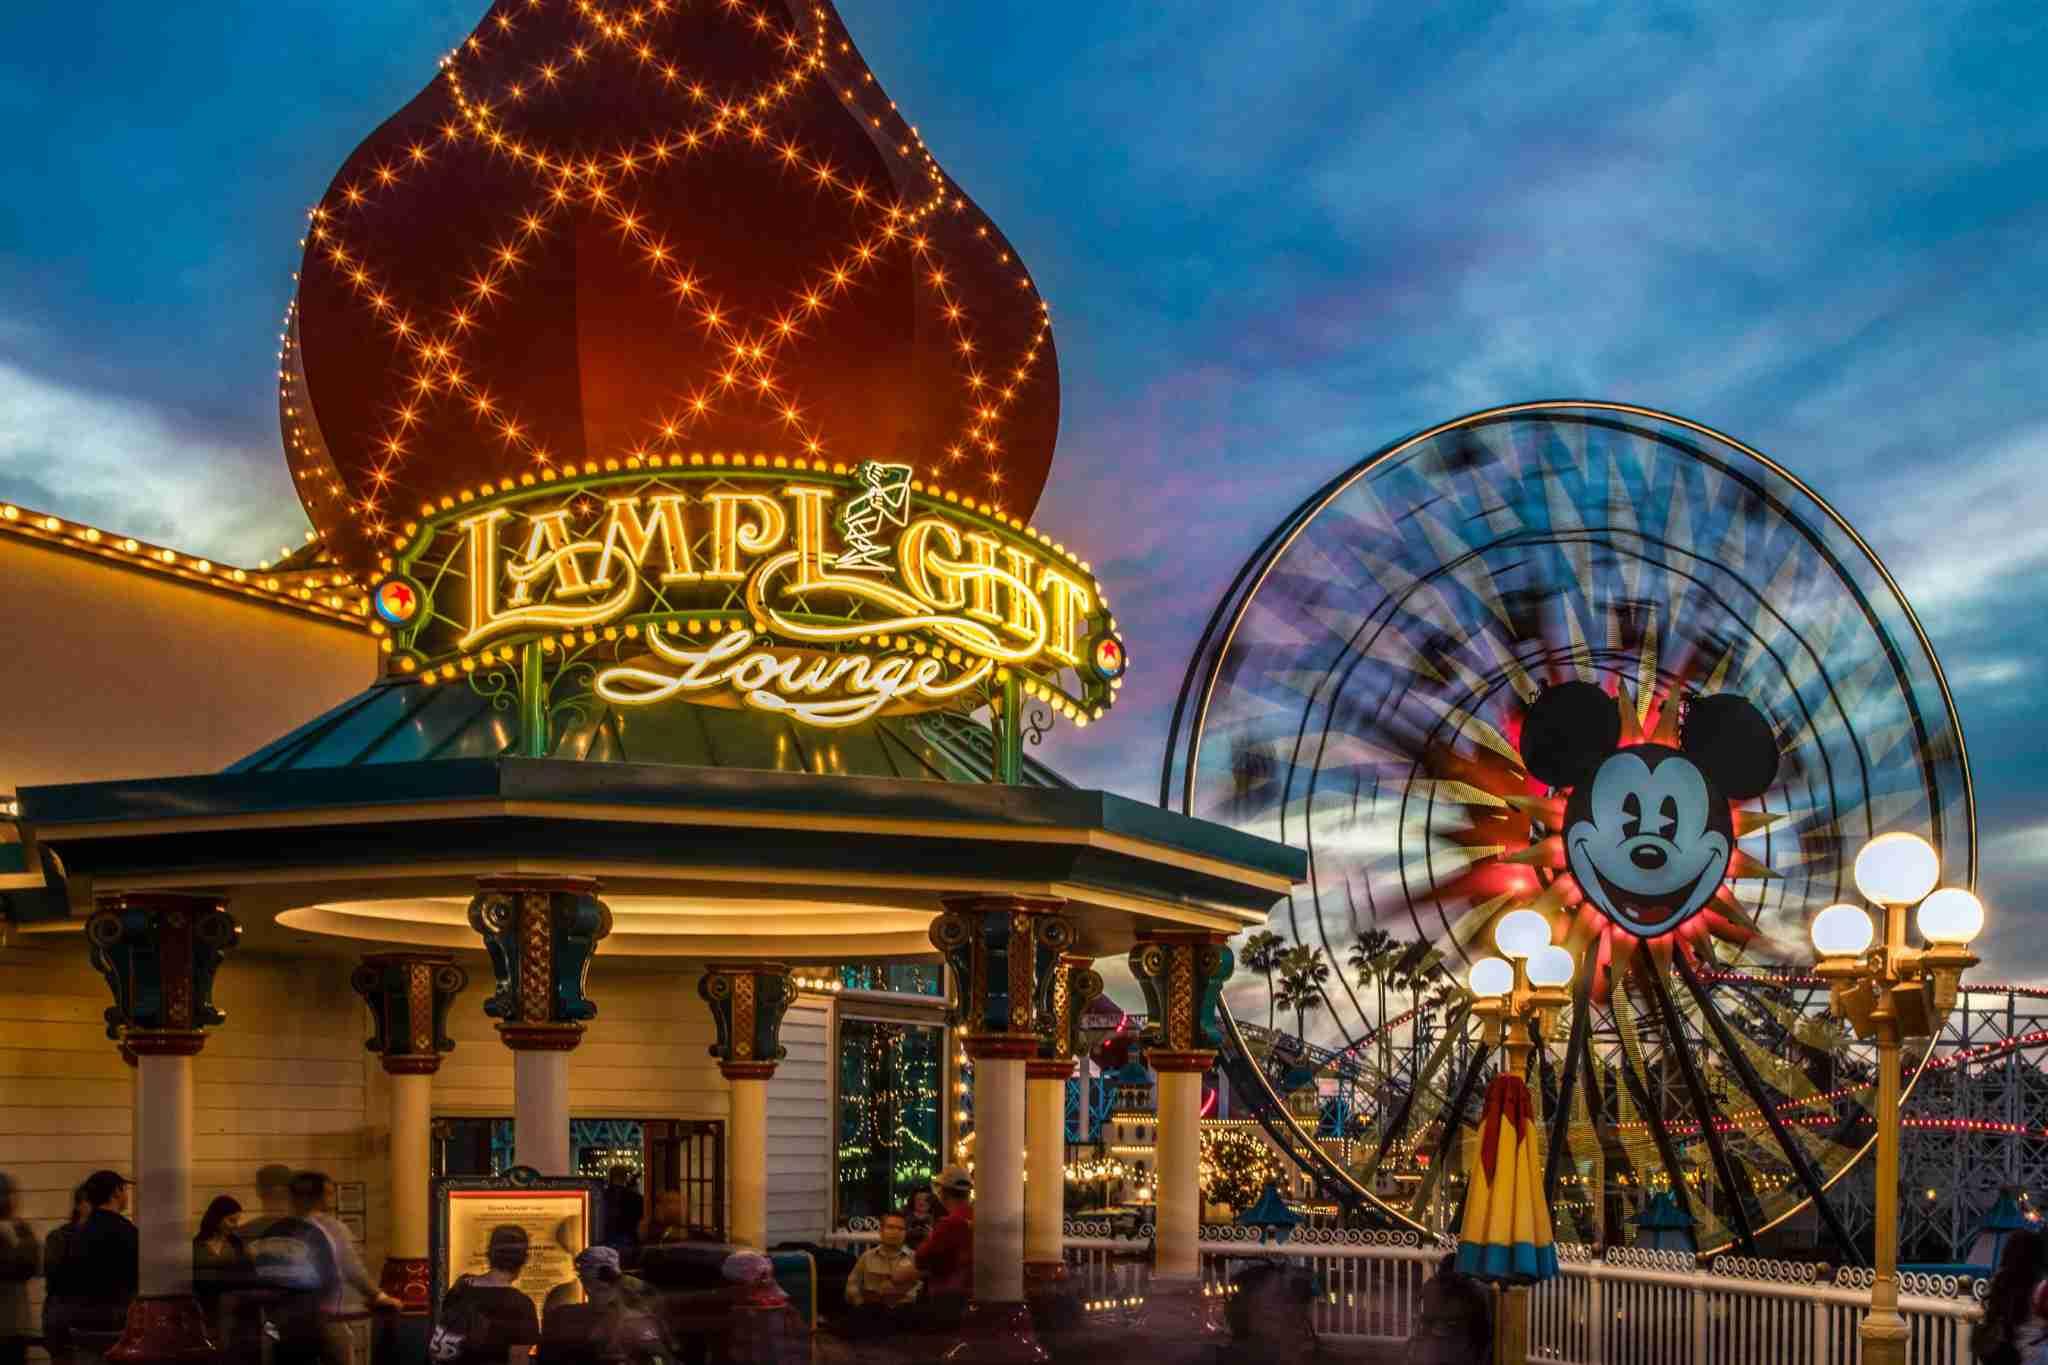 Best Disneyland Restaurants for Families - Lamplight Lounge